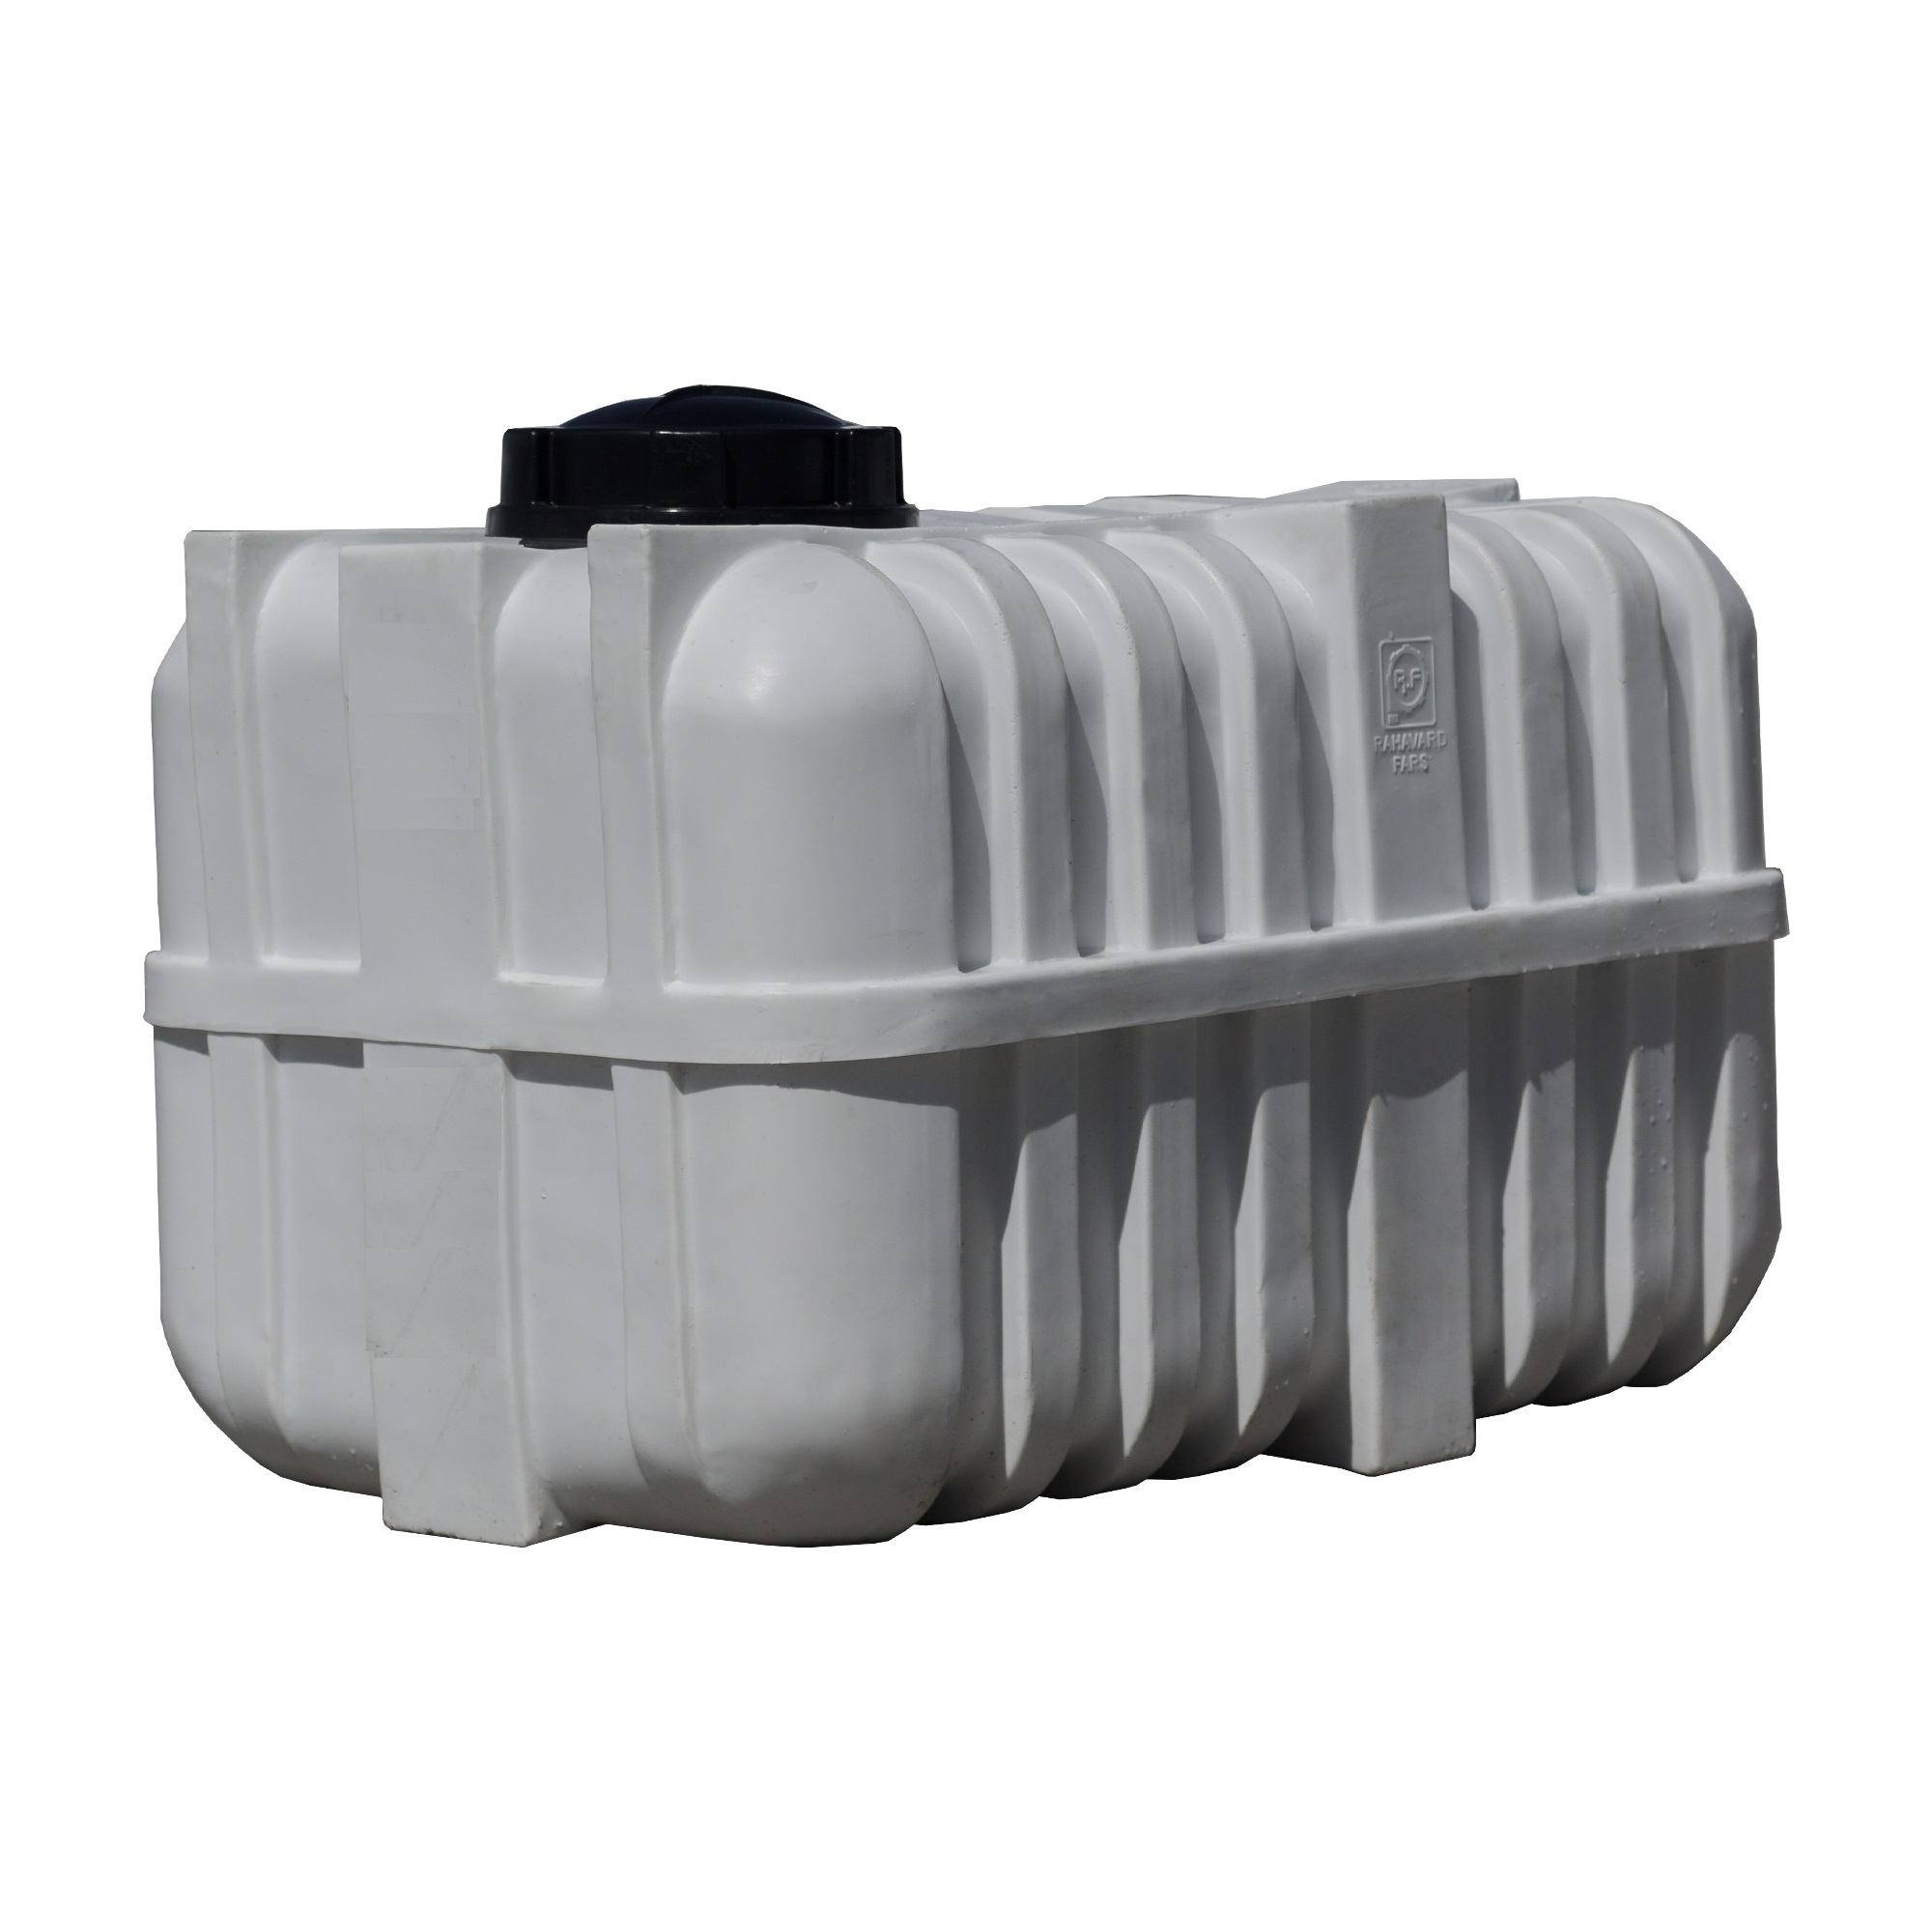 قیمت                                      مخزن آب رهاورد فارس کد 4900 حجم 300 لیتر